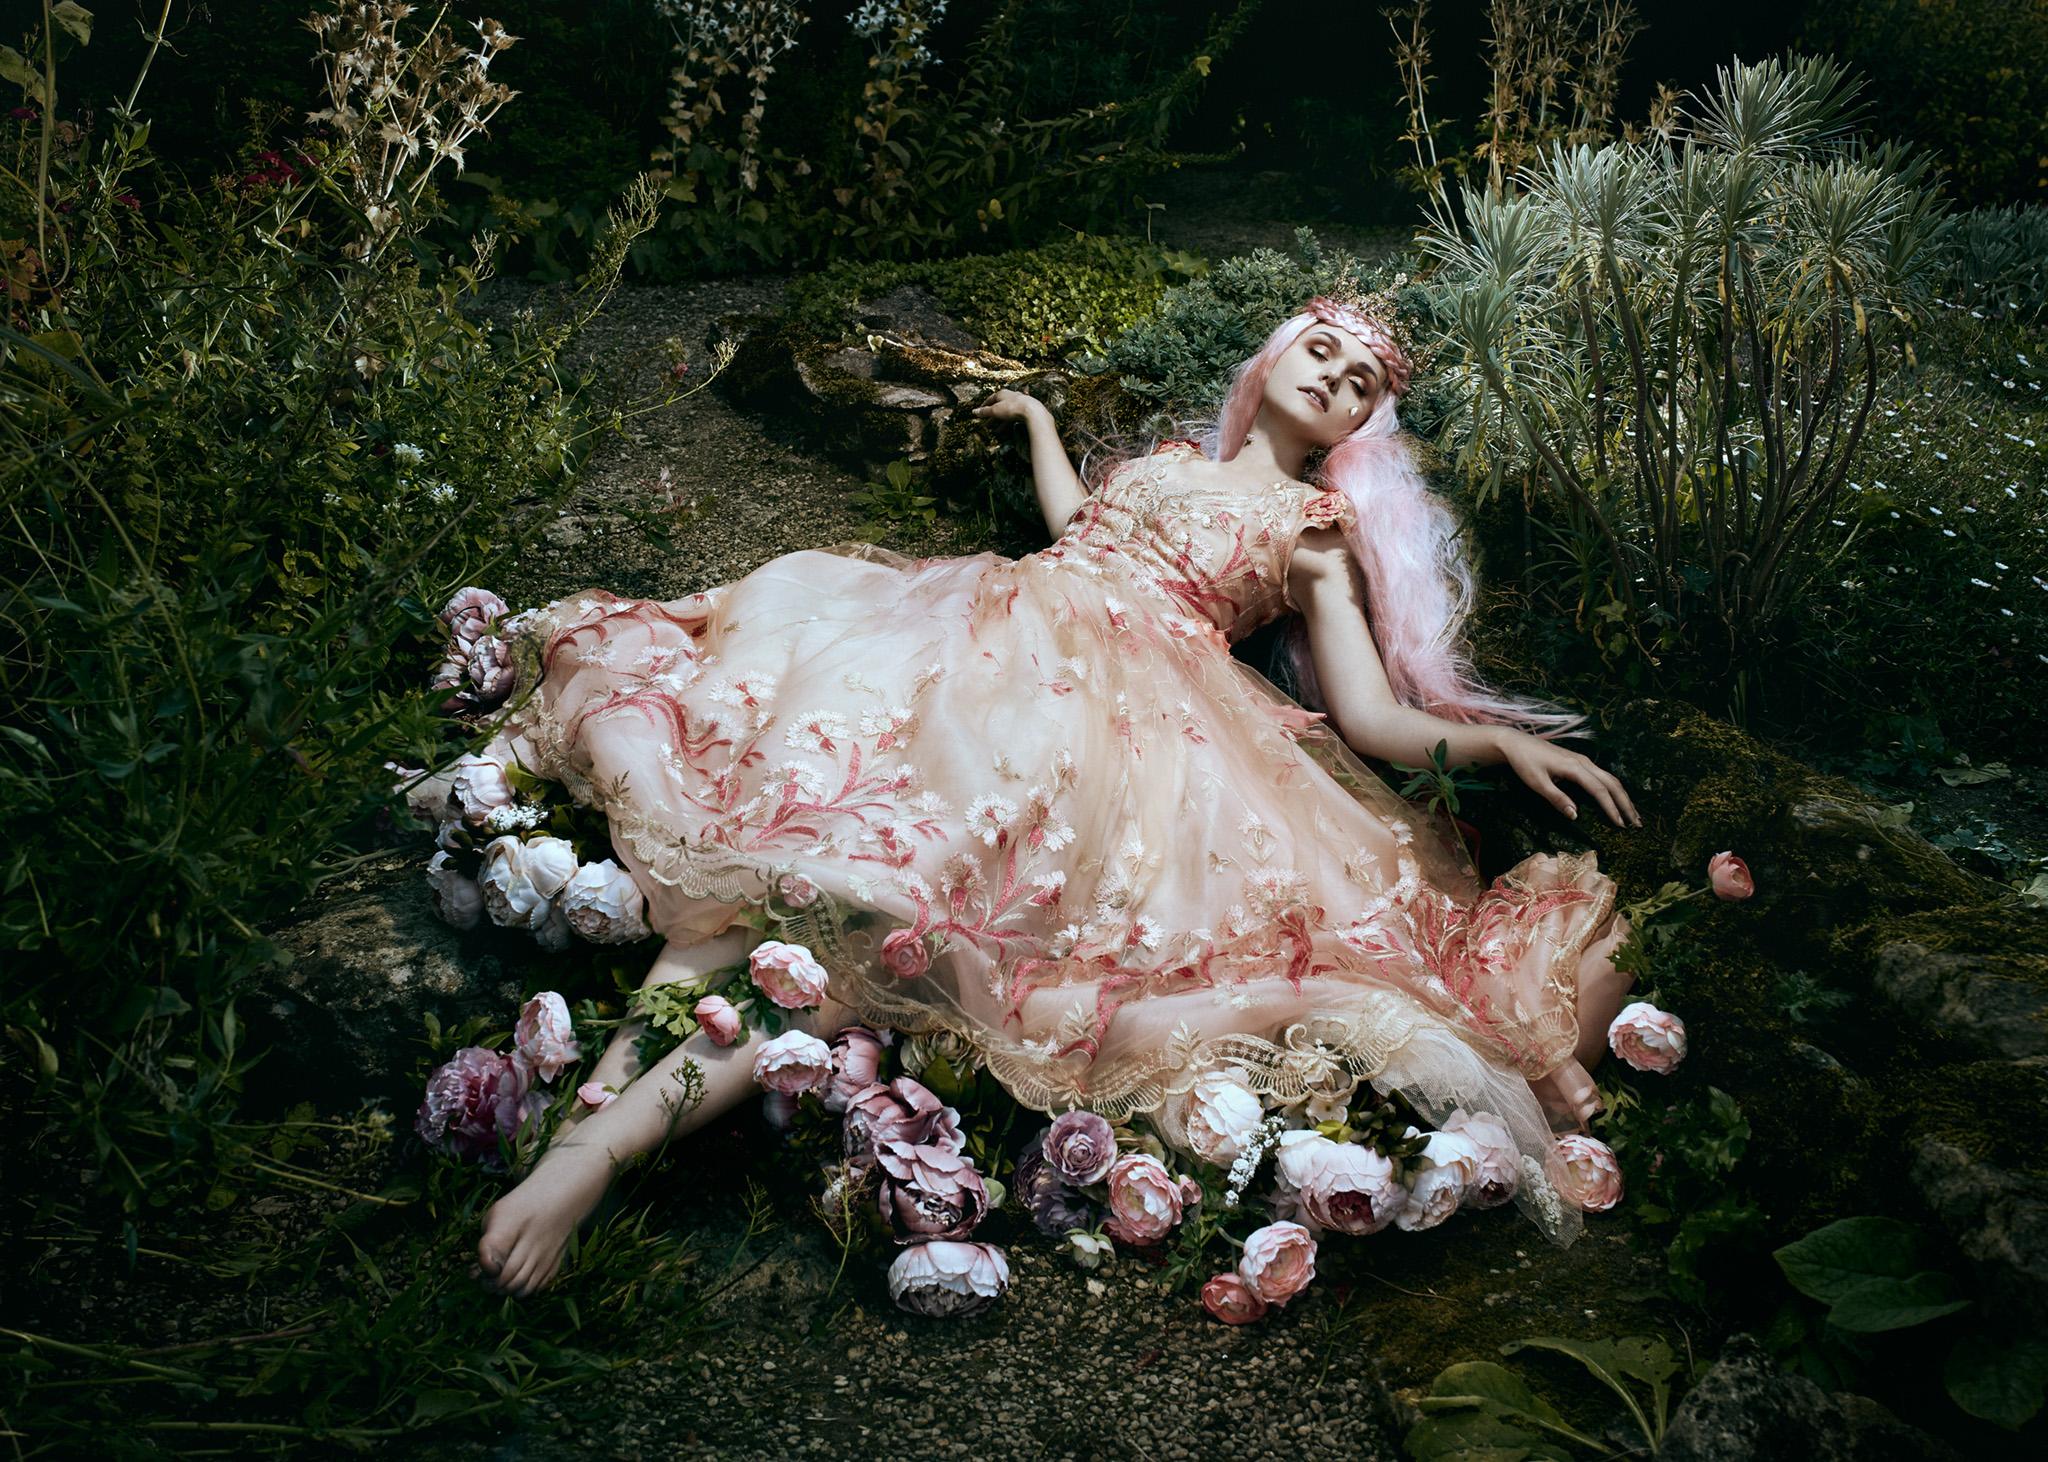 Bella_Kotak_Profoto_Canon_Fairytale_Fantasy_Photography_Portrait_Portraiture_Flowers_FLoral_Queen_Princess_Disney_Fashion_Editorial_A1_Lighting_Pink_Hair_Magical_Ethereal_Solstice_Retouch_2.jpg